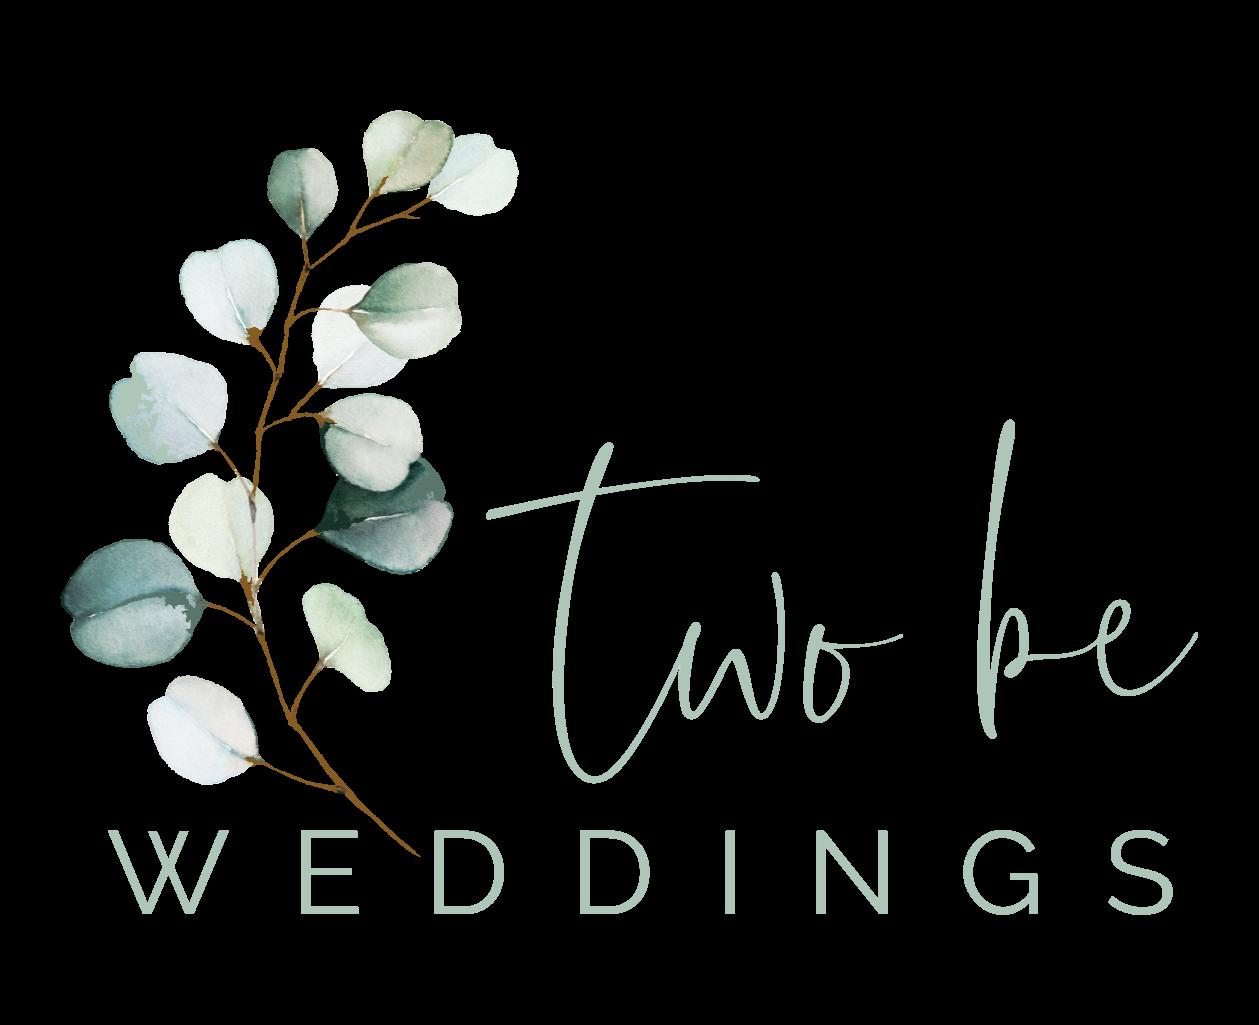 Two Be Weddings